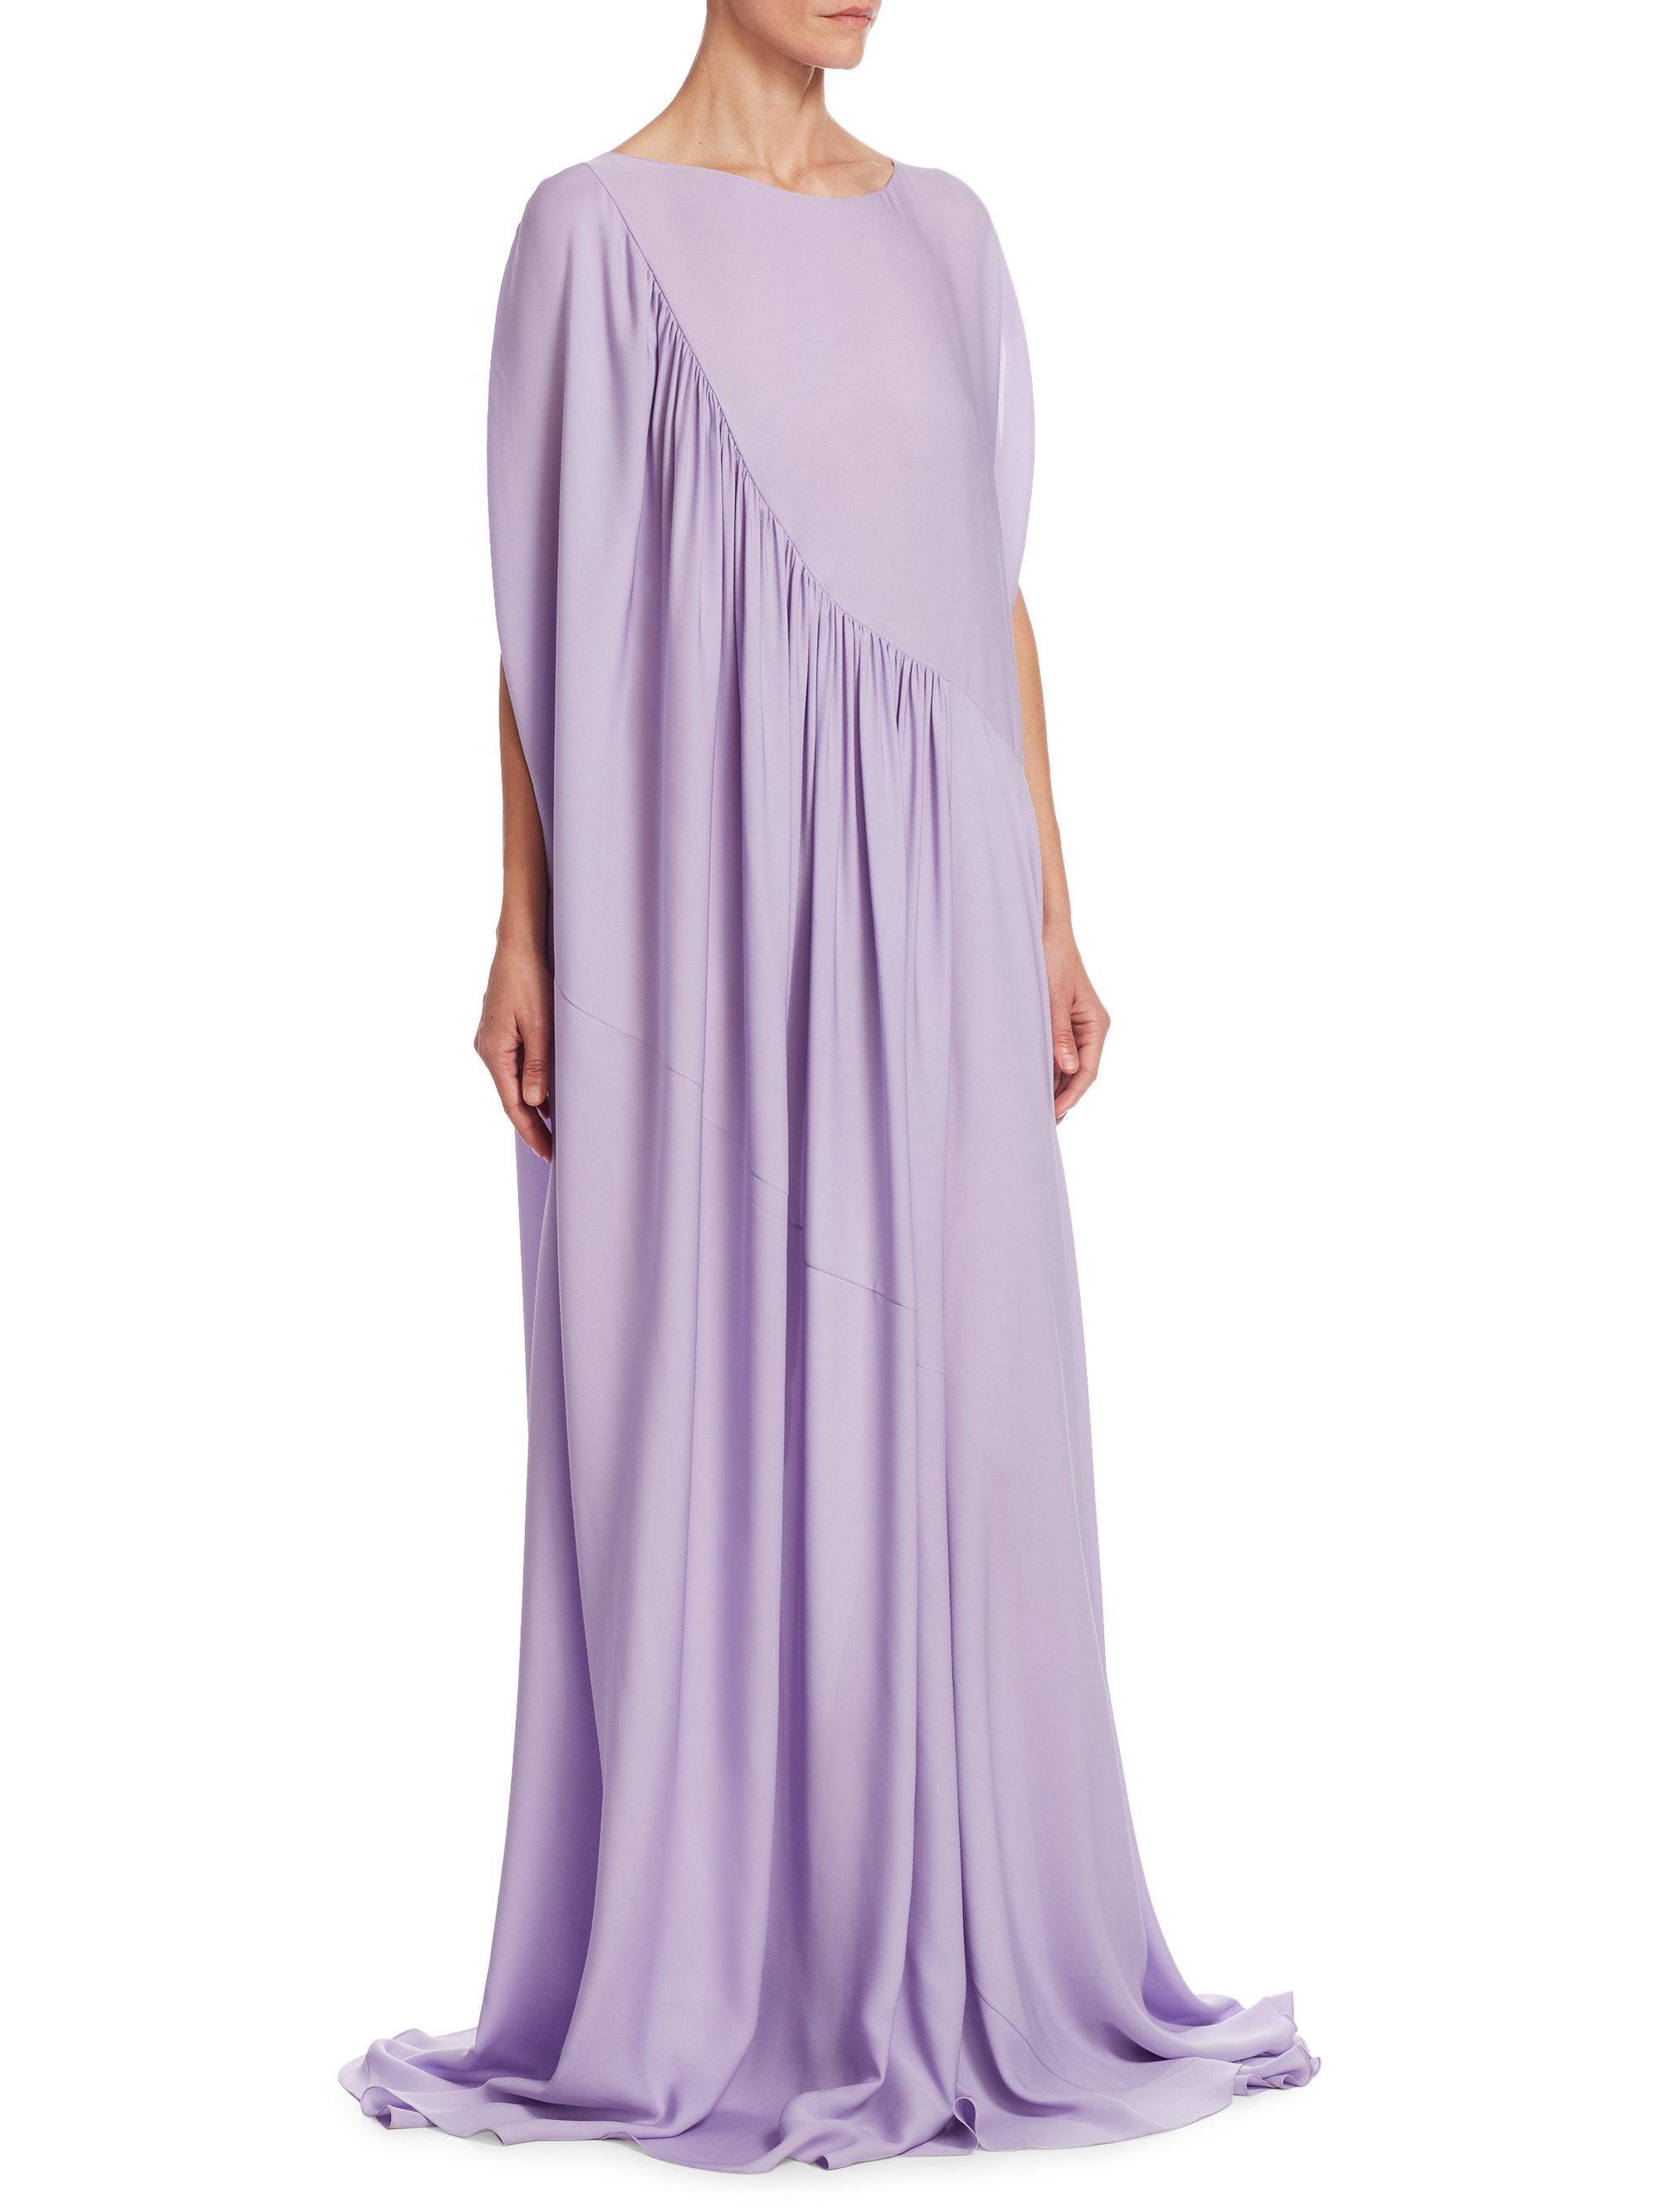 Lyst - The Row Medea Silk Ruffle Gown in Purple